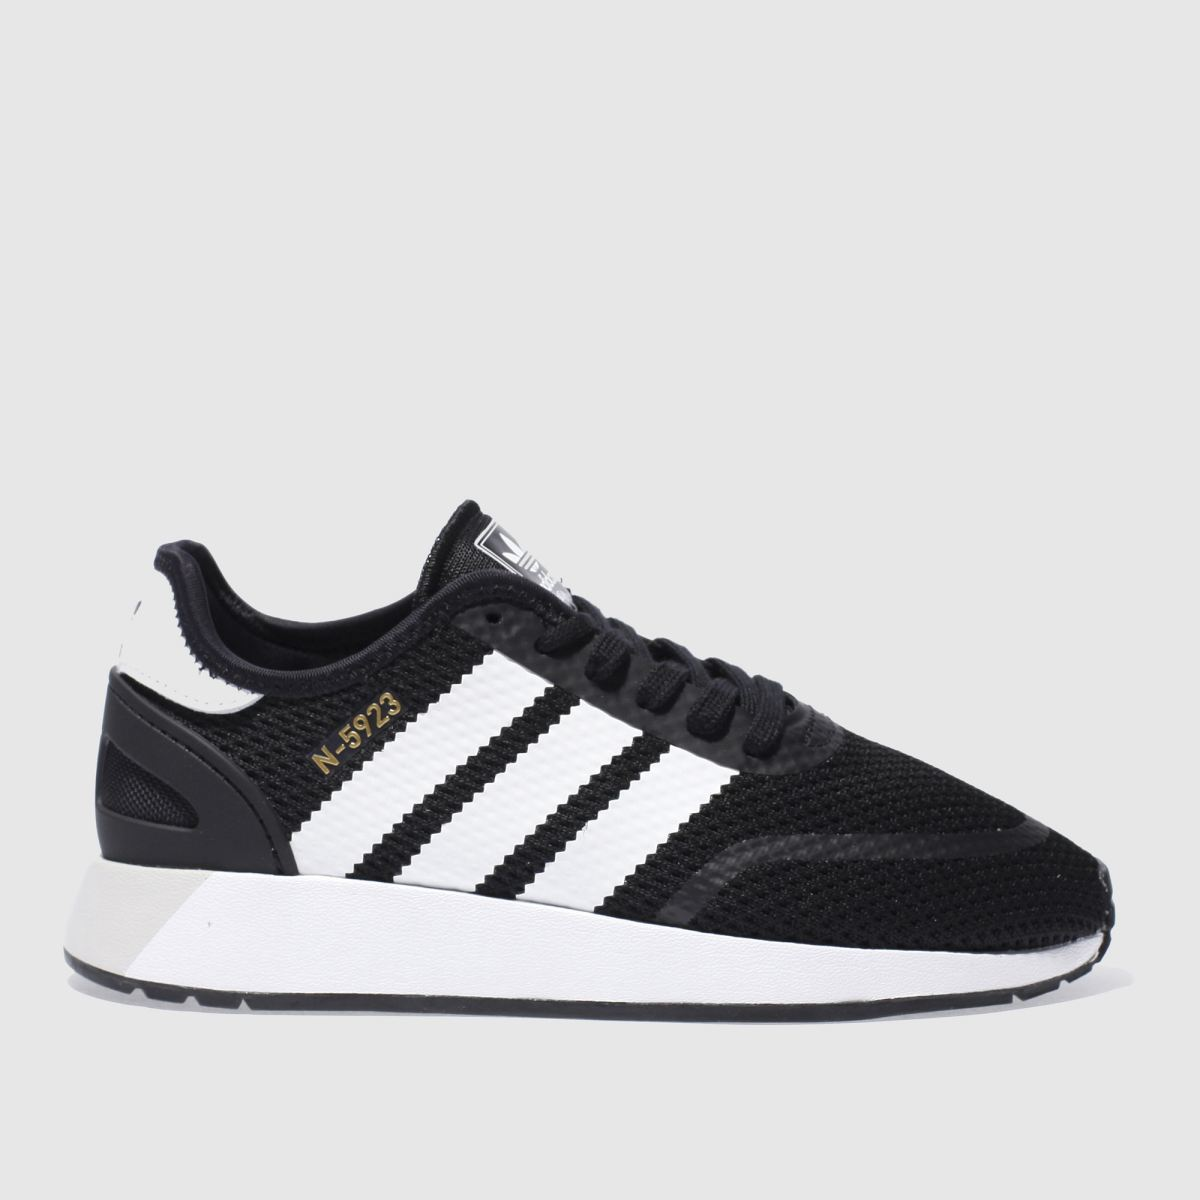 Adidas Black & White N-5923 Trainers